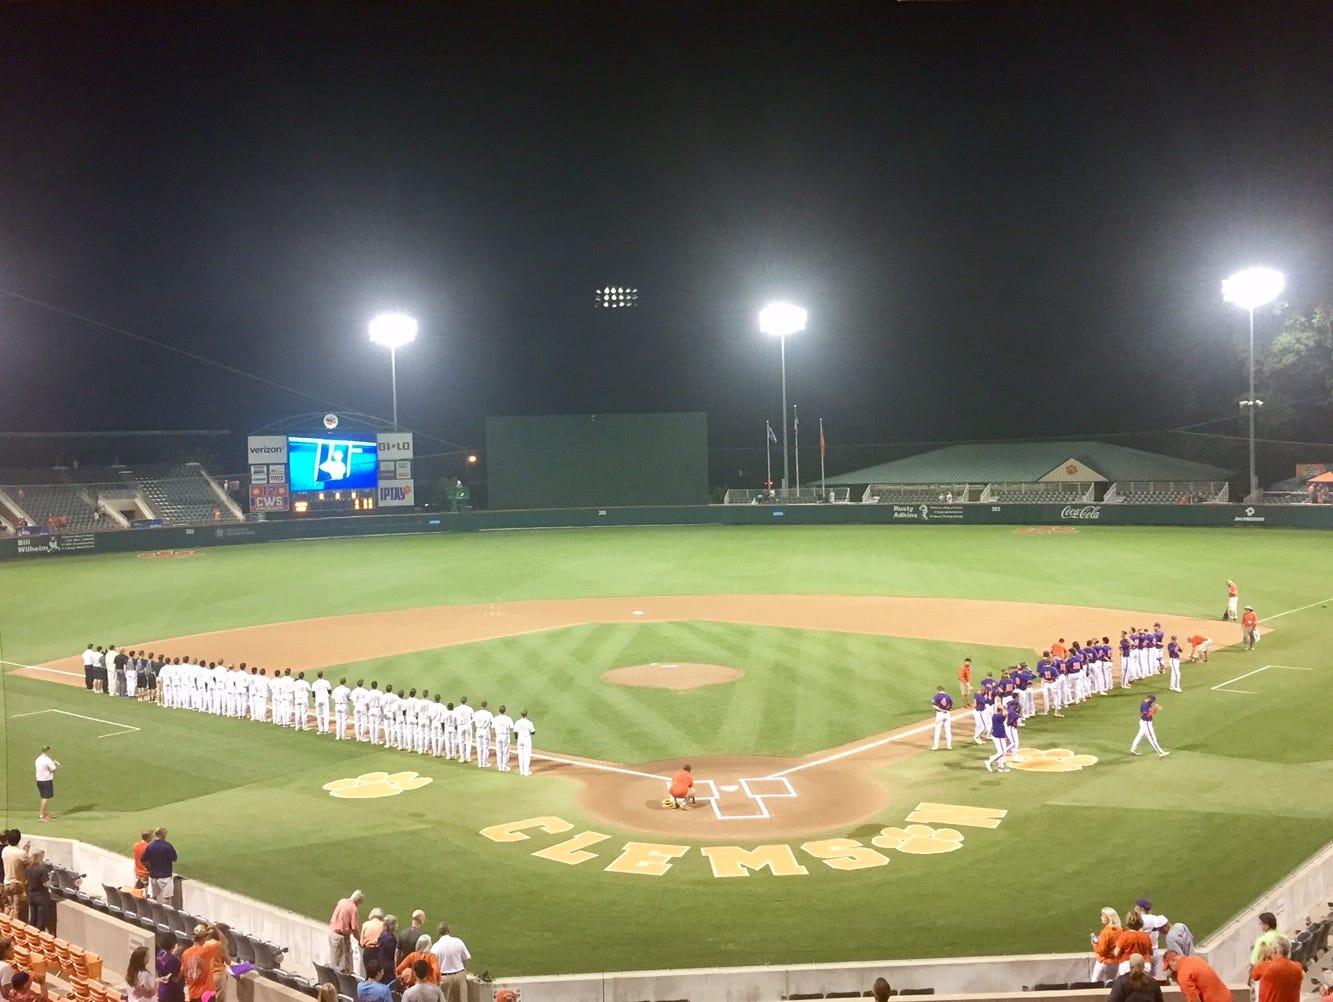 Clemson vs. Vanderbilt in an NCAA Regional final Sunday night in Clemson, S.C.